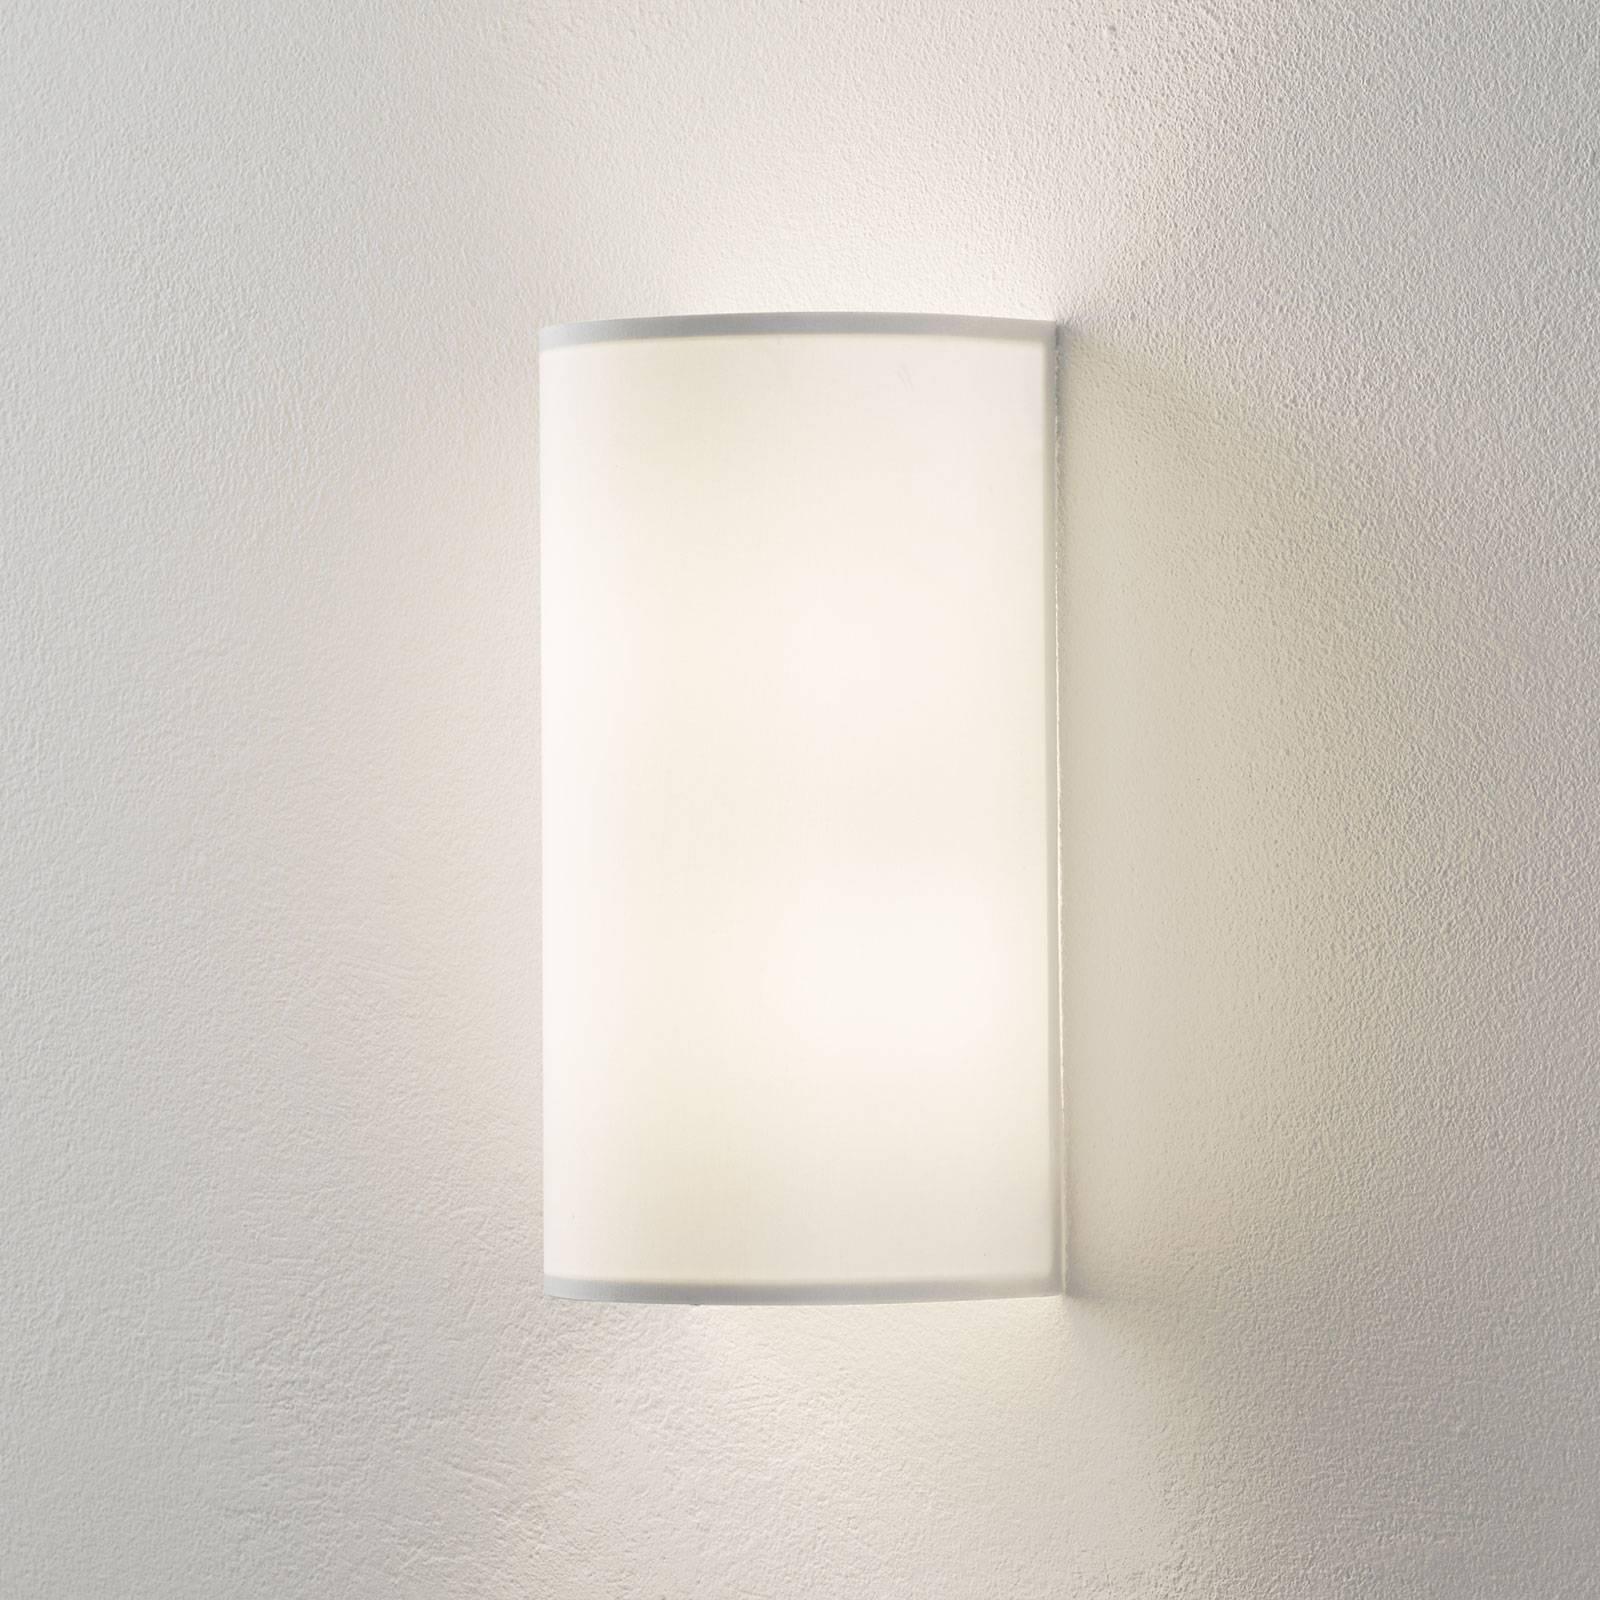 Lucande Patrik wandlamp halfrond 30cm wit